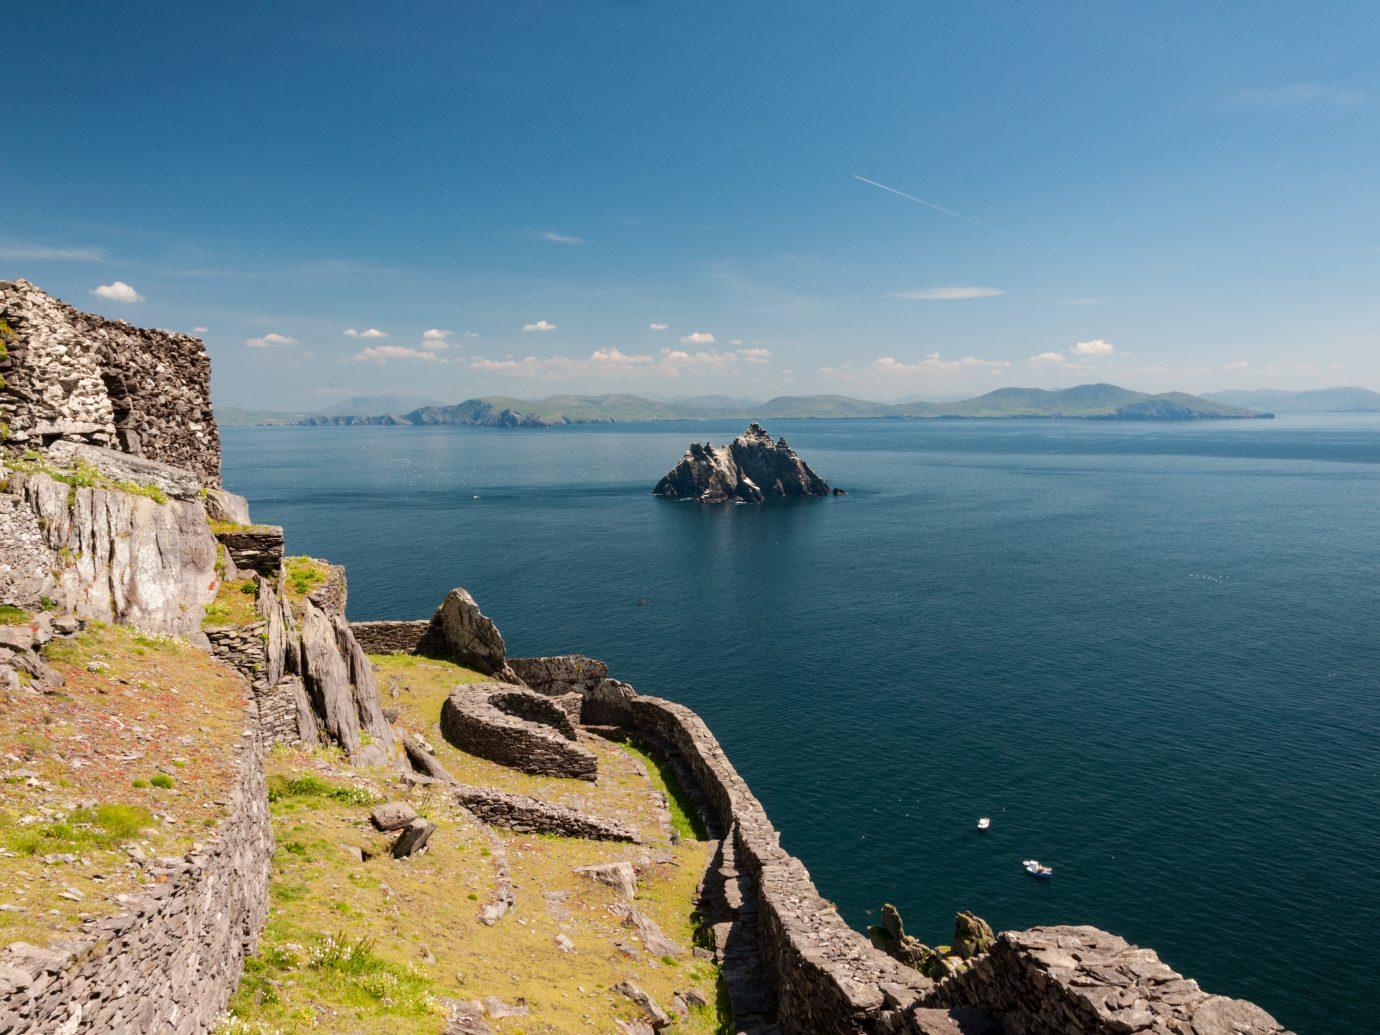 Skellig Michael, UNESCO World Heritage Site, Kerry, Ireland. Star Wars The Force Awakens Scene filmed on this Island. wild atlantic way